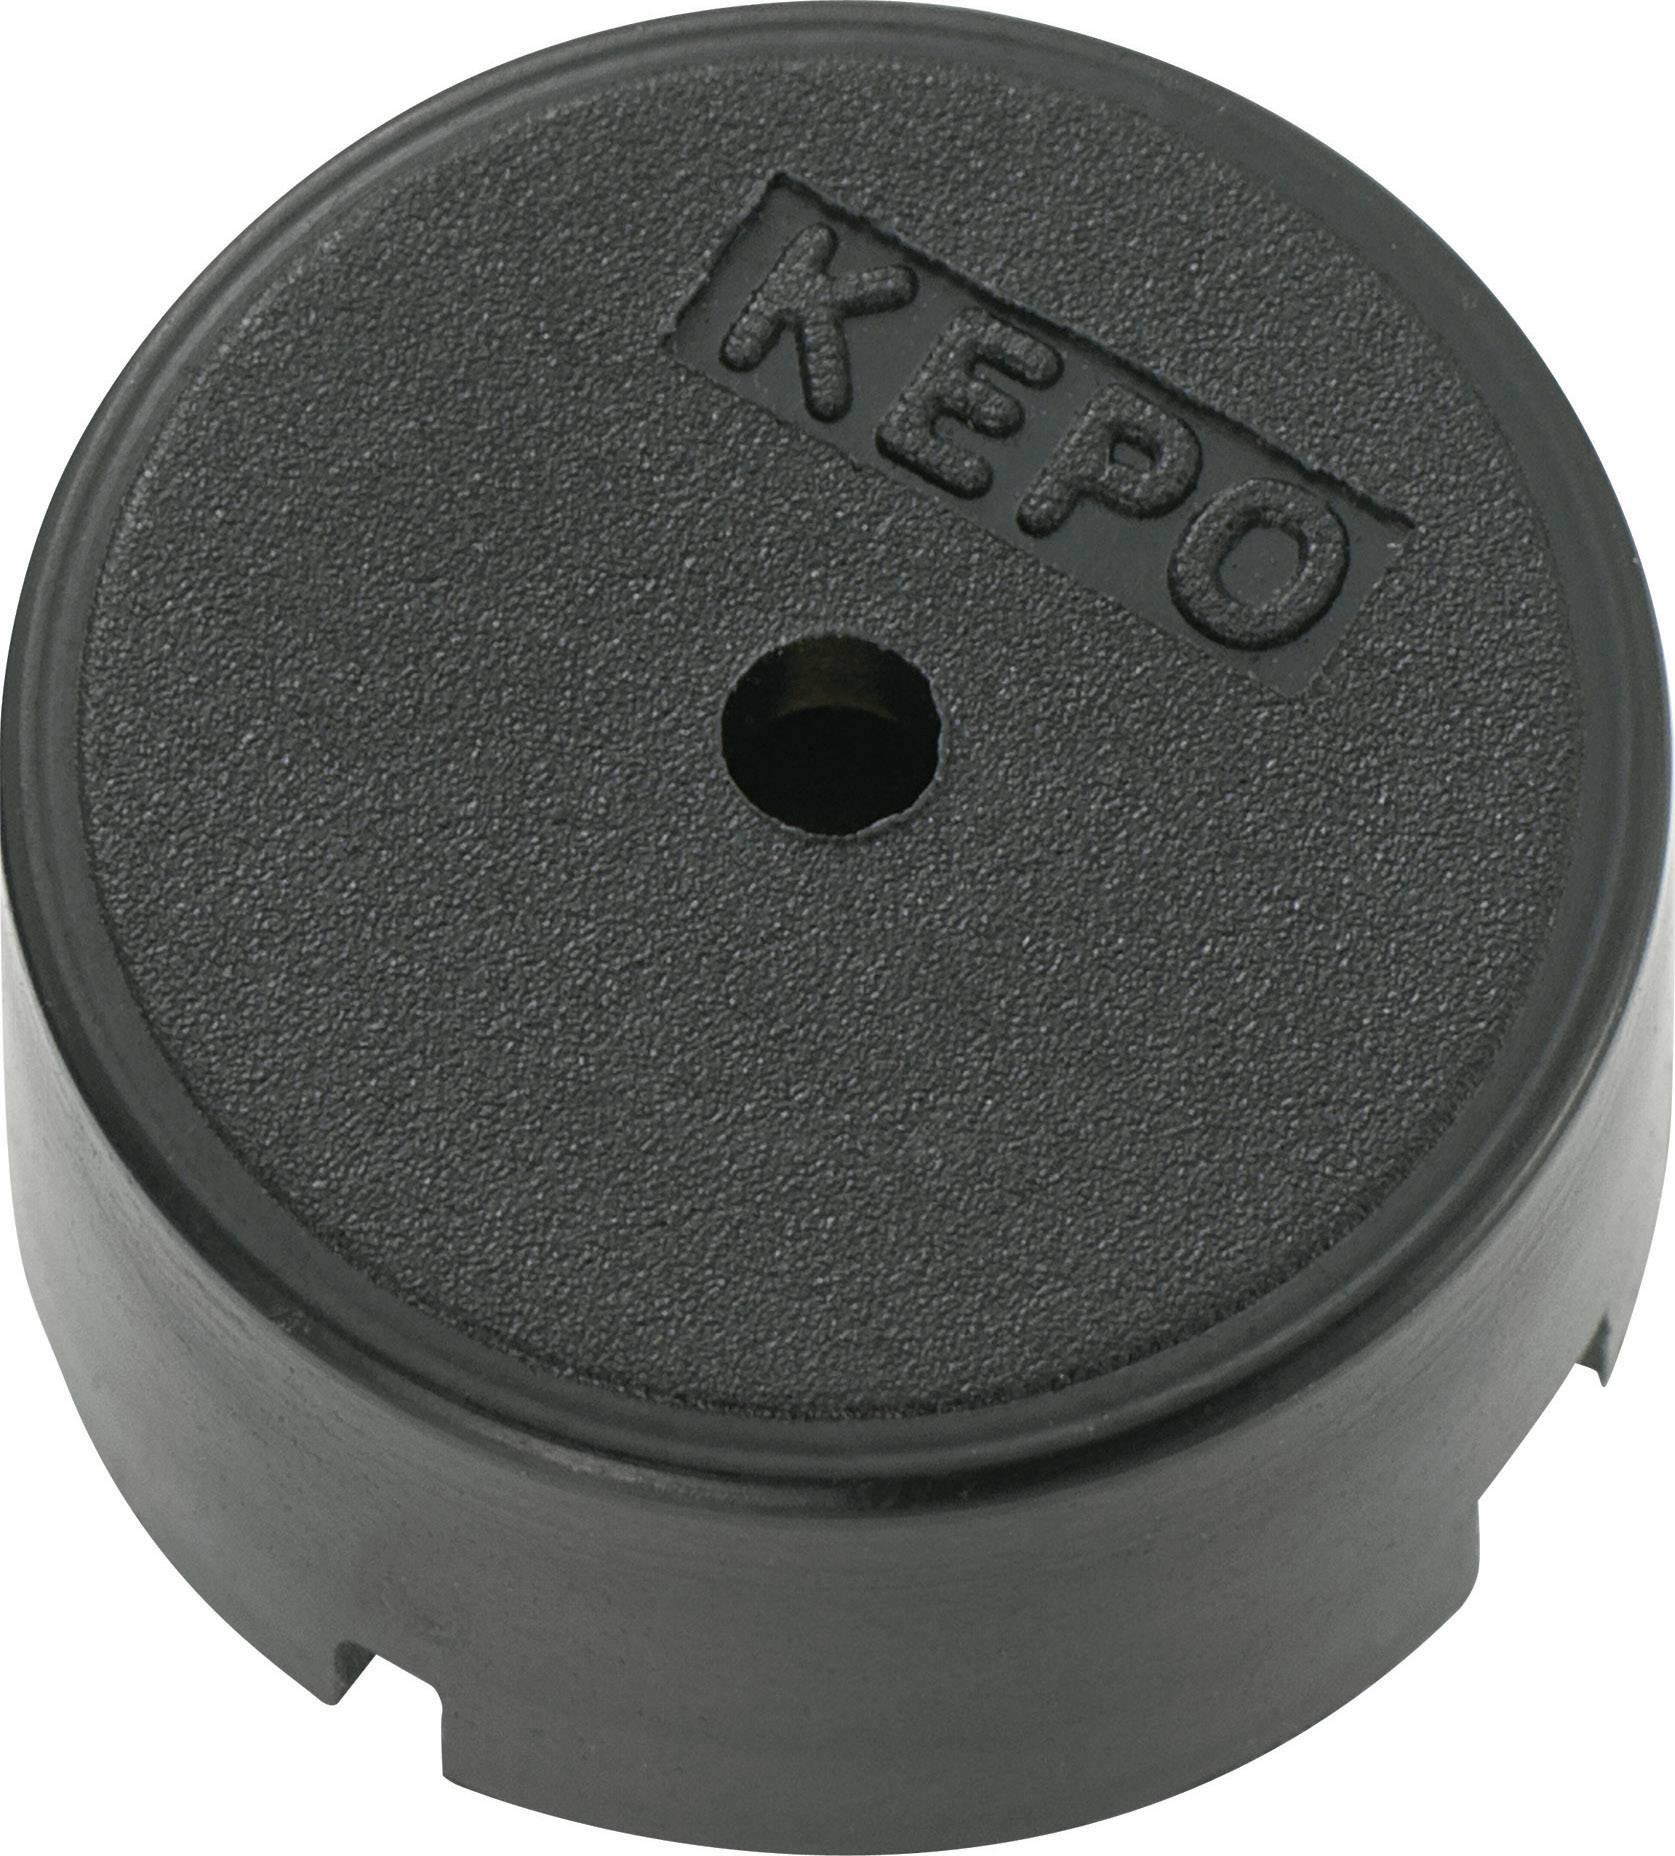 Piezoměnič, 80 dB 9 V/AC, KPT-G1340P35A-05-6236